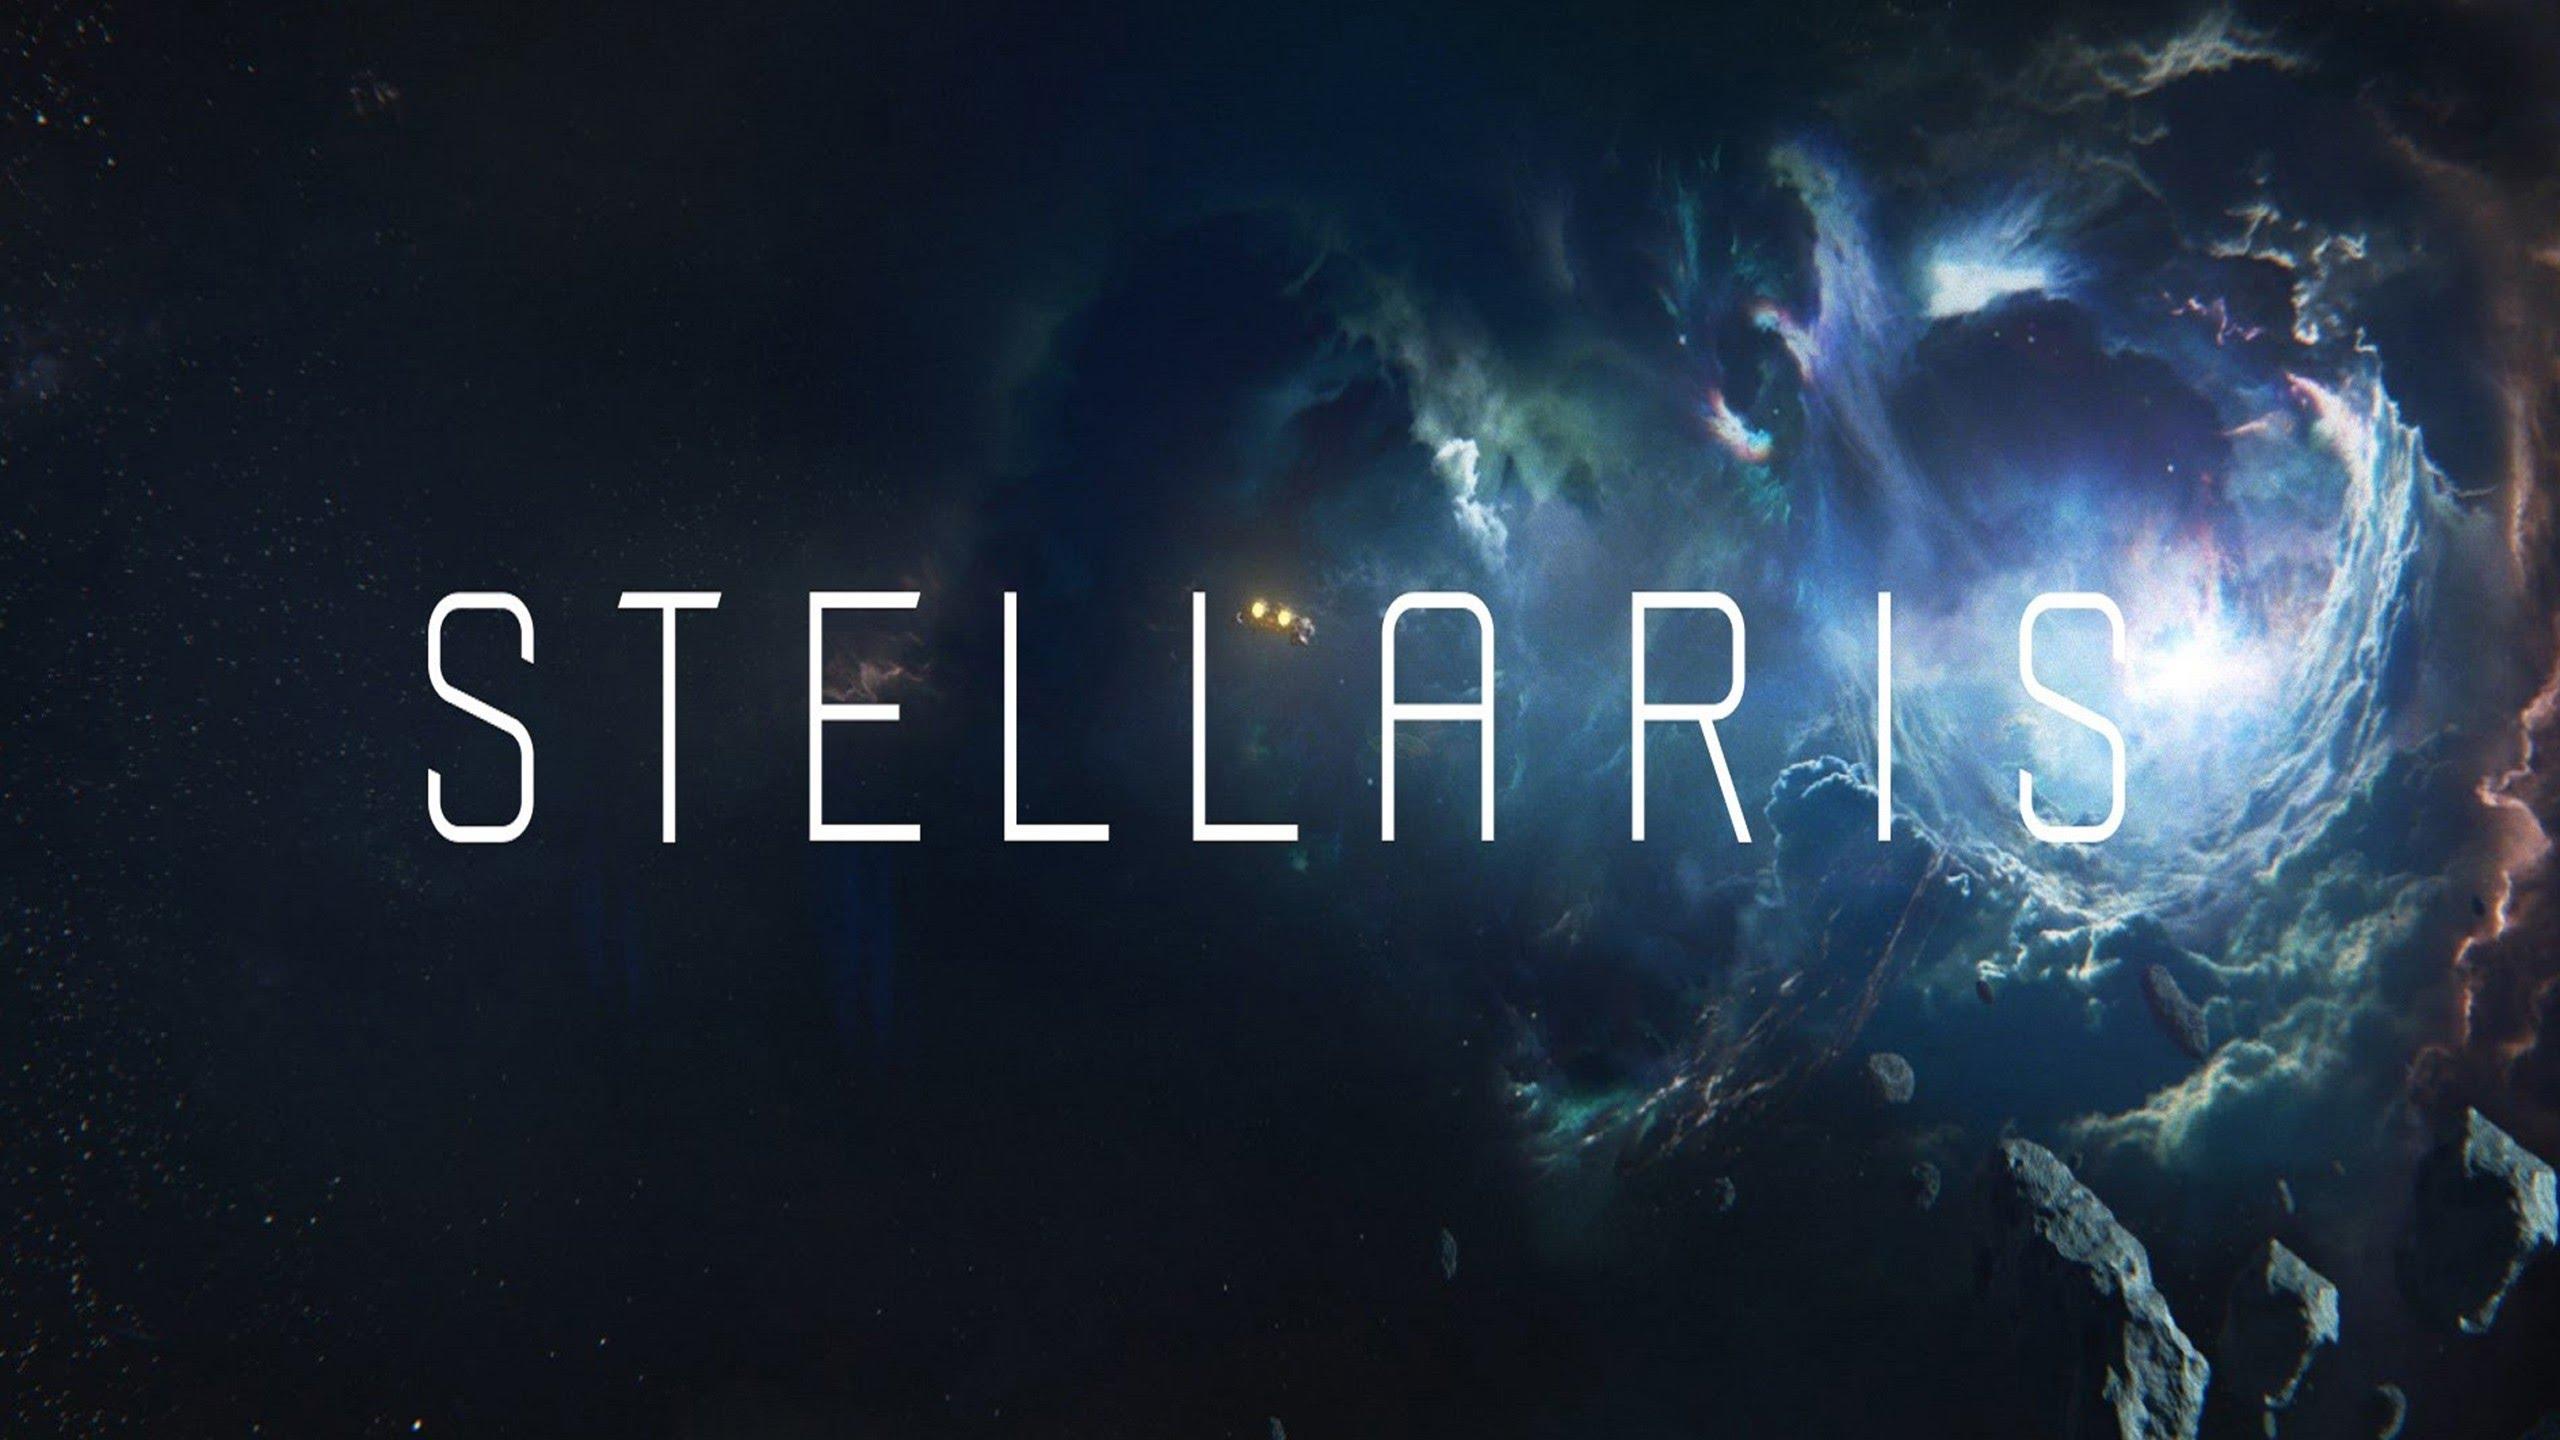 stellaris image id 11259 image abyss